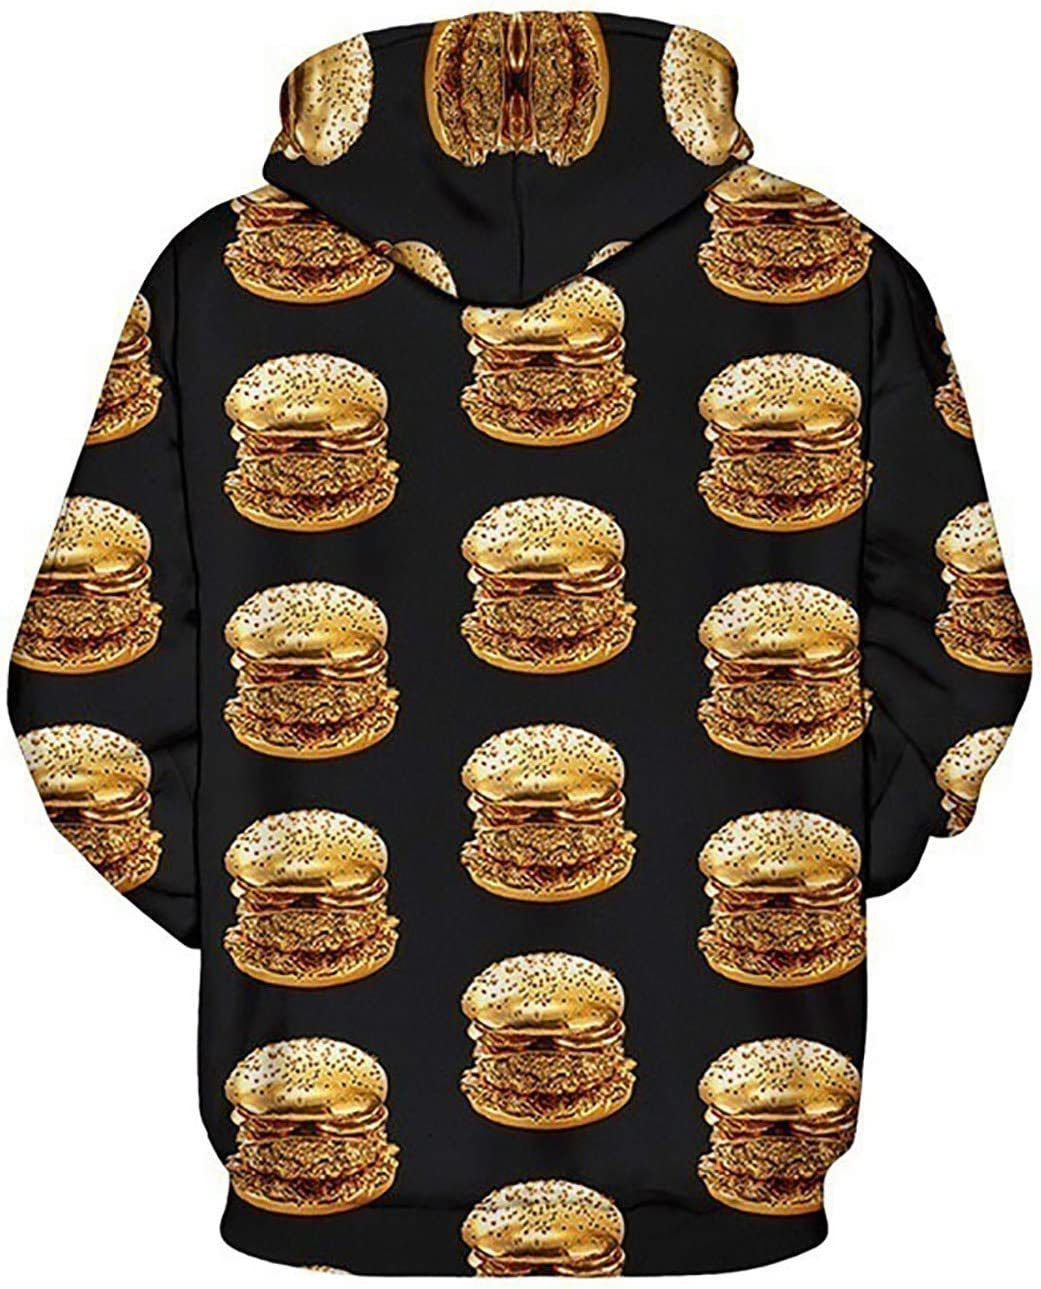 JUNG KOOK Men Women Funny 3D Digital Printing Hoodie Ramen Donut Sweatershirt Sweater Coat